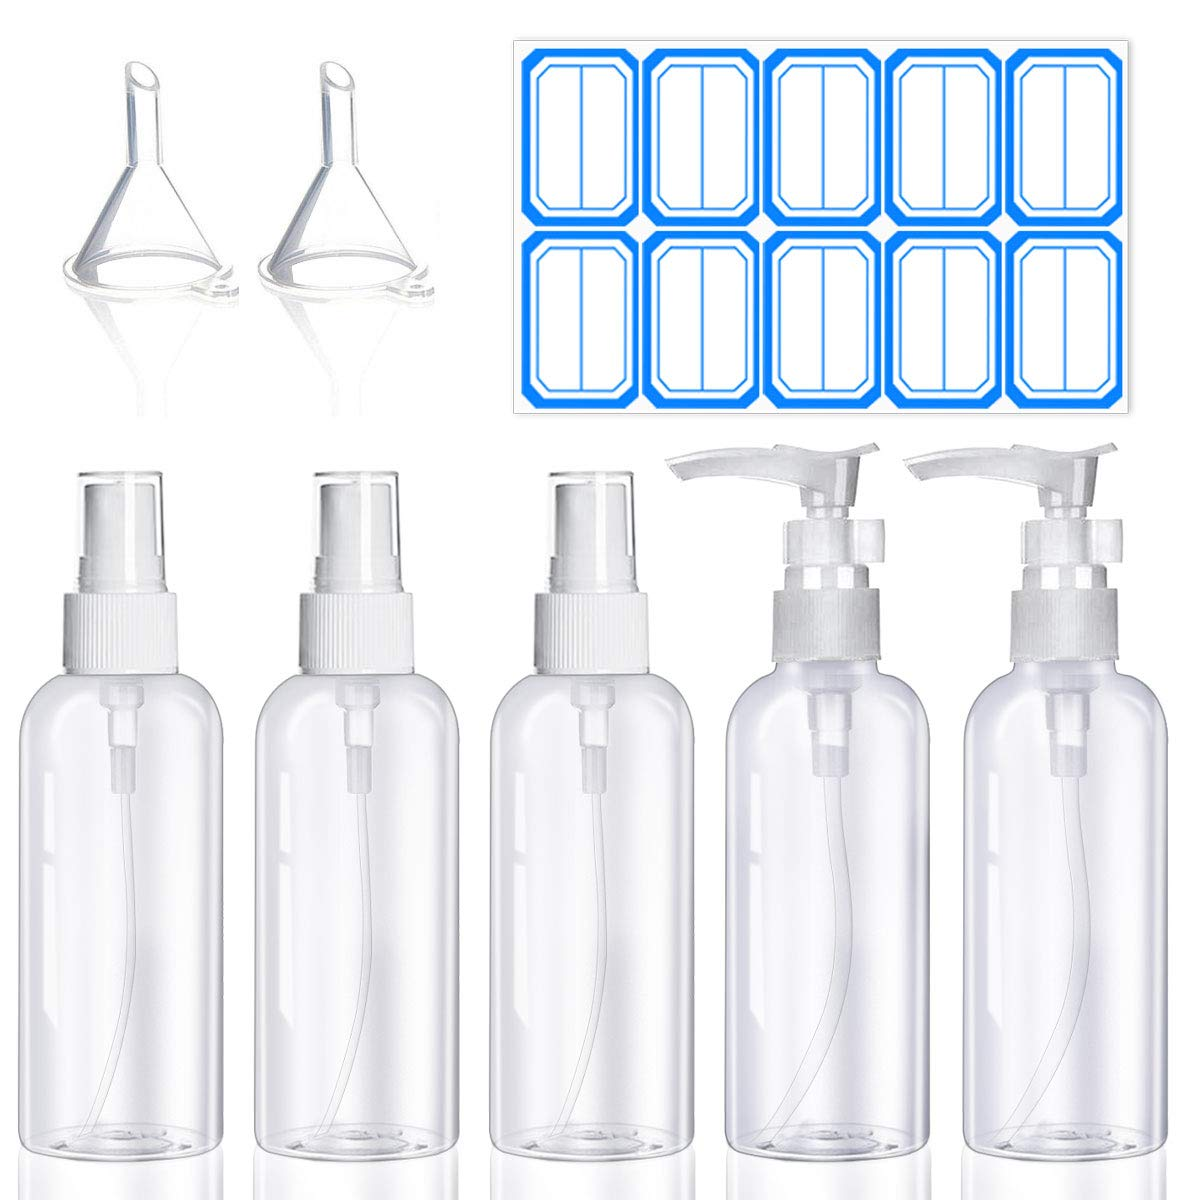 Plastic Spray Bottle Set - 5 Pack 50ML Travel Mini Spray Bottles and Pump Bottle Portable Refillable Containers Leak Proof Travel Bottles for Liquid Soap